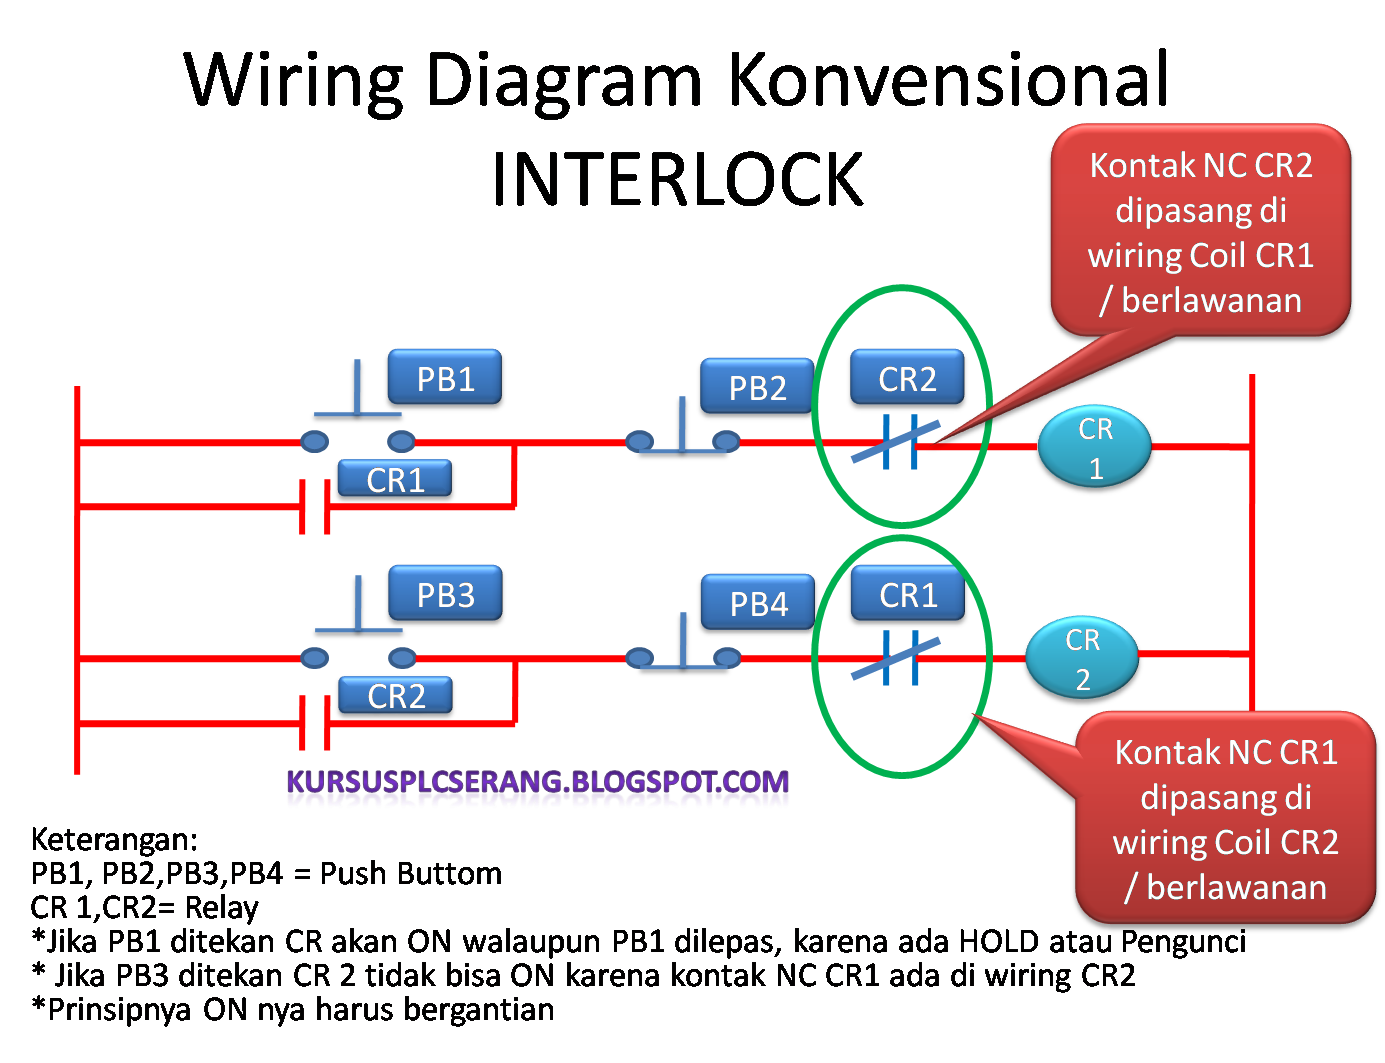 wiring diagram artinya e bike controller wiring diagram 4).rangkaian/wiring hold dan interlock ~ privat plc ... #11